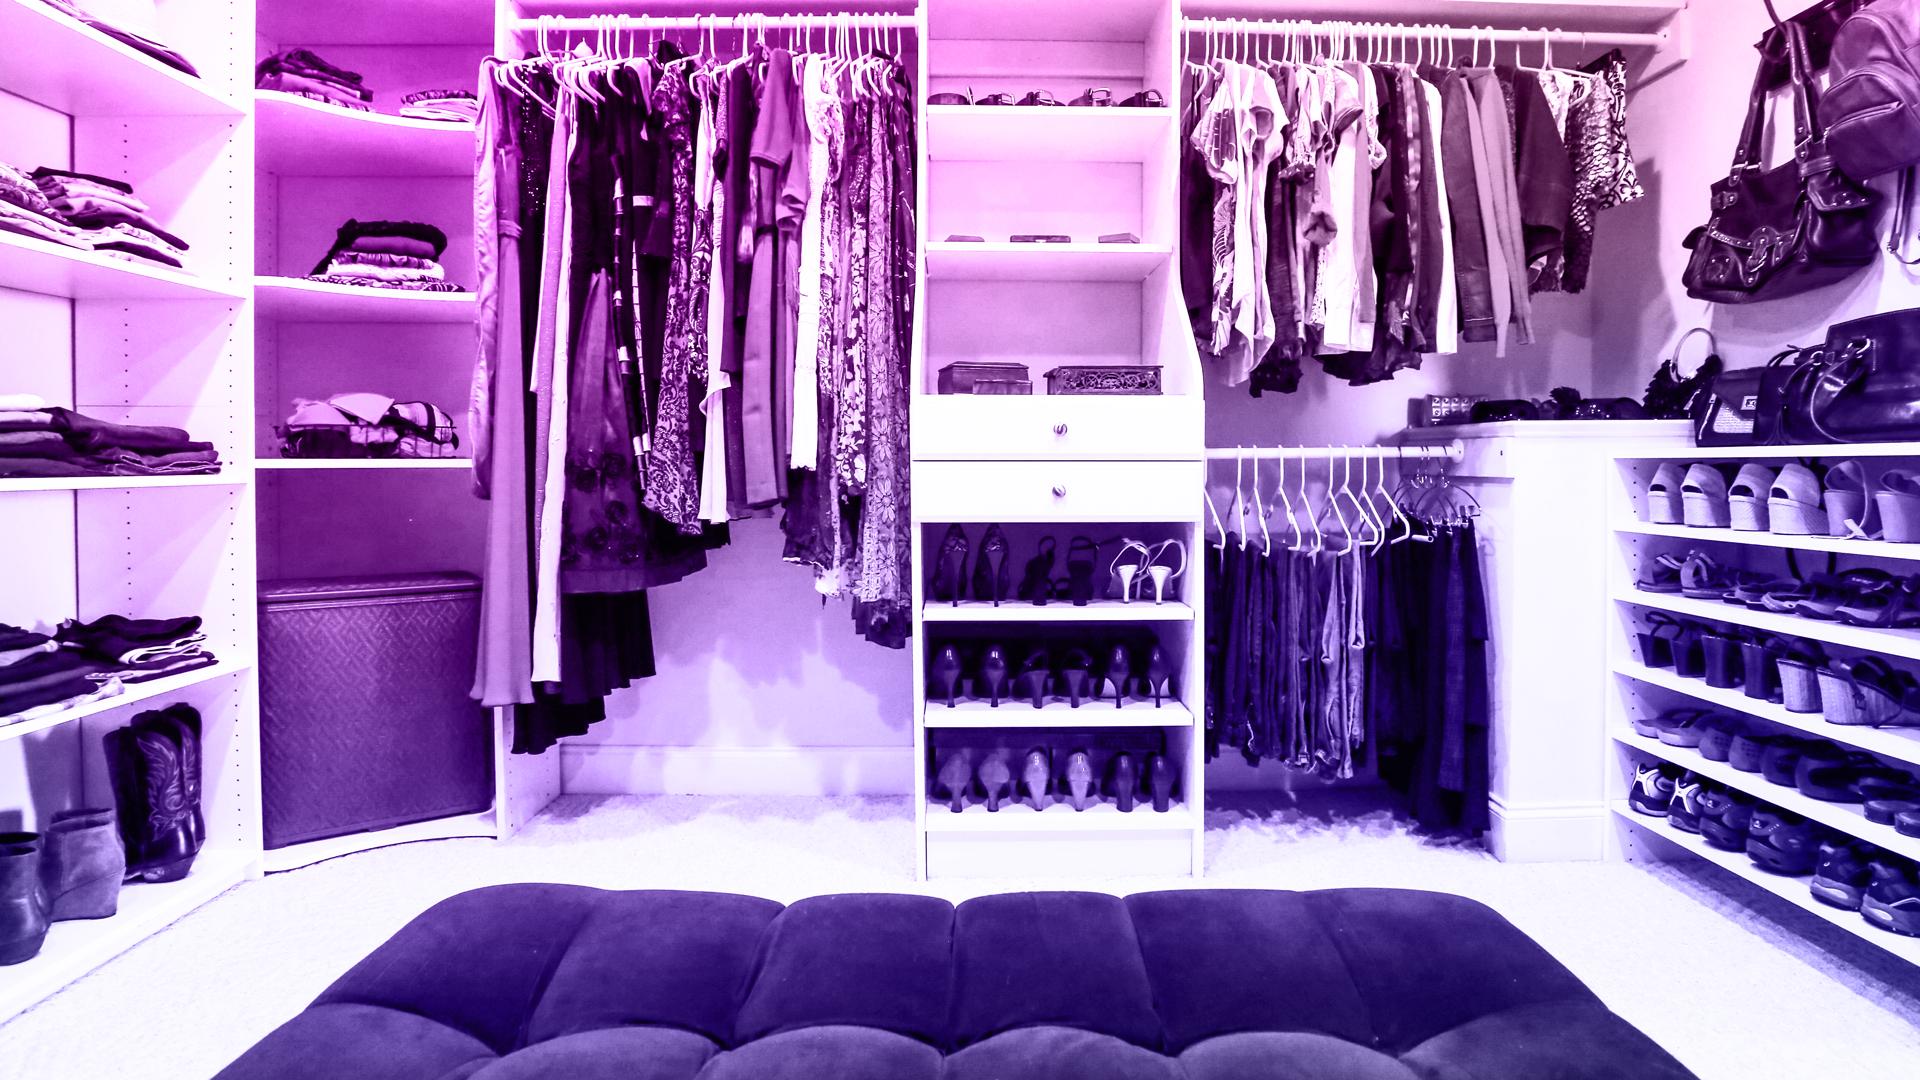 STYLECASTER | Closet Decluttering Guide